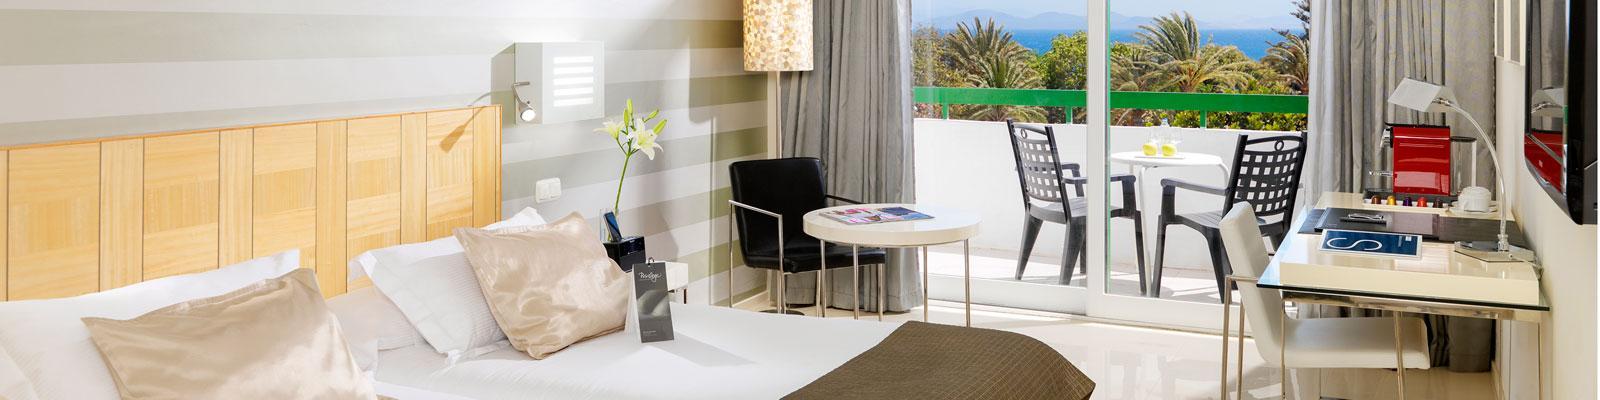 H10 Lanzarote Princess - Playa Blanca Hotel